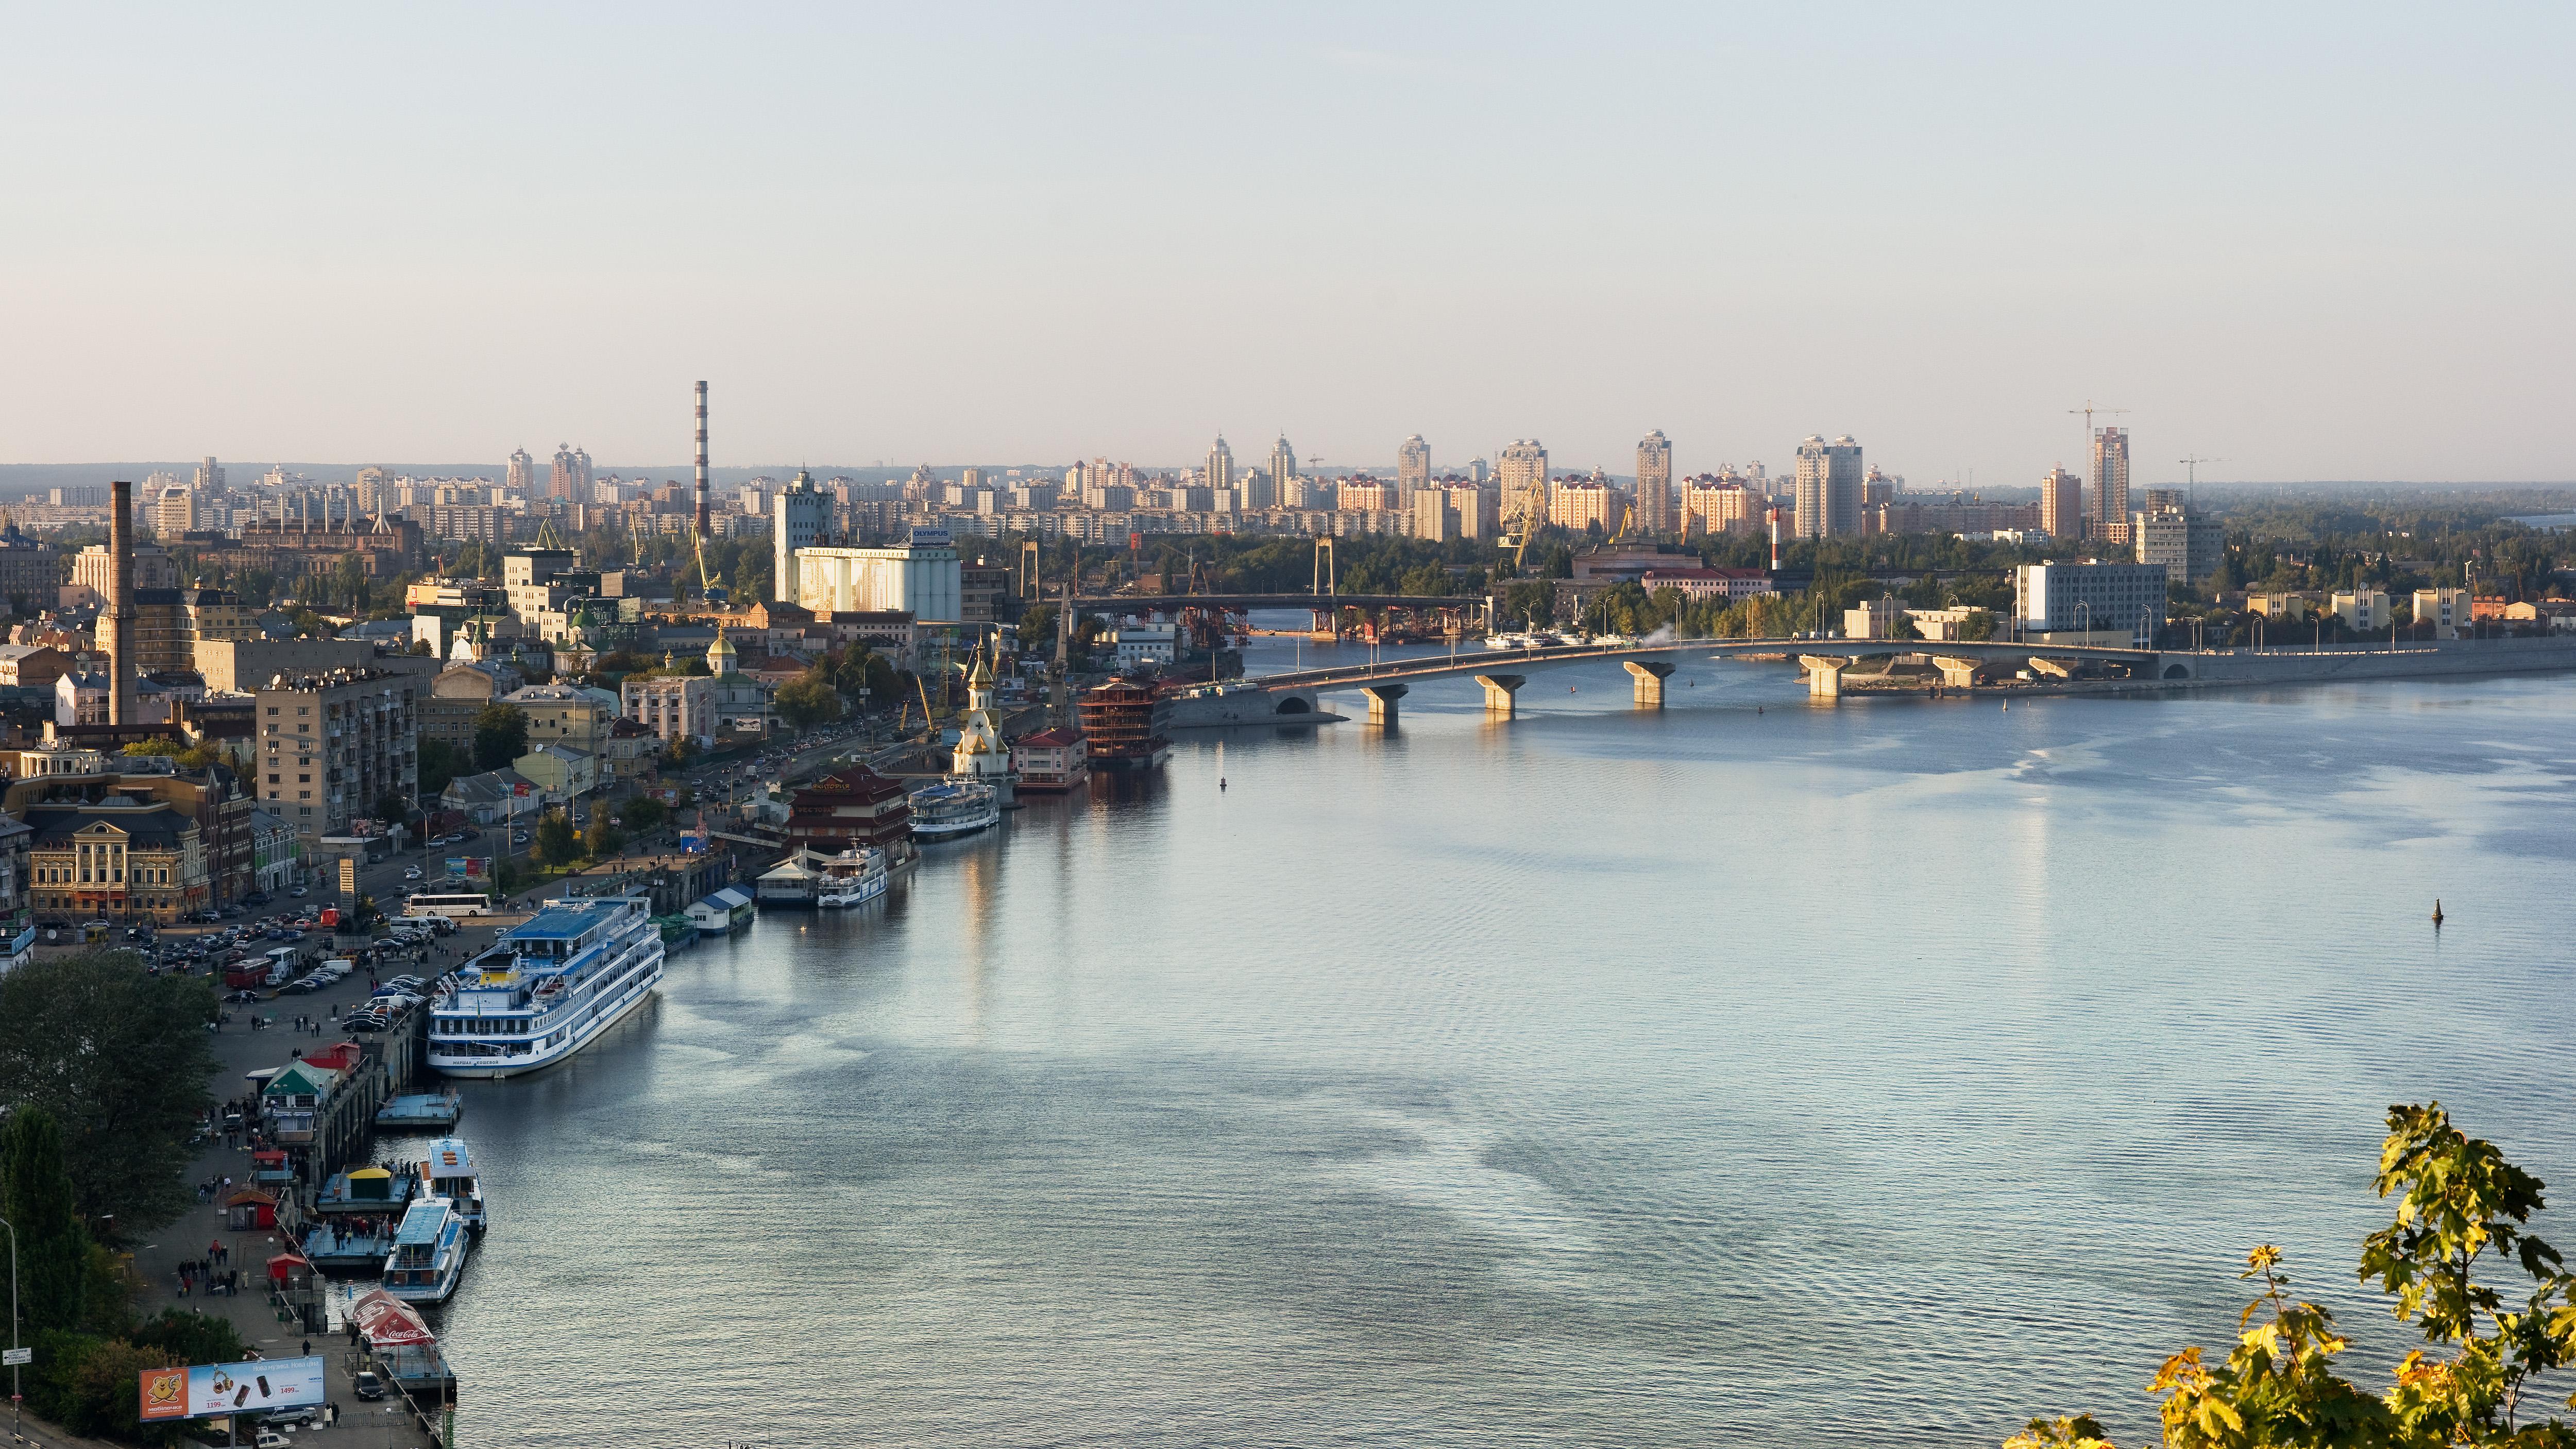 Dinyeper Nehri nereden başlıyor Dinyeper Nehri başlıyor